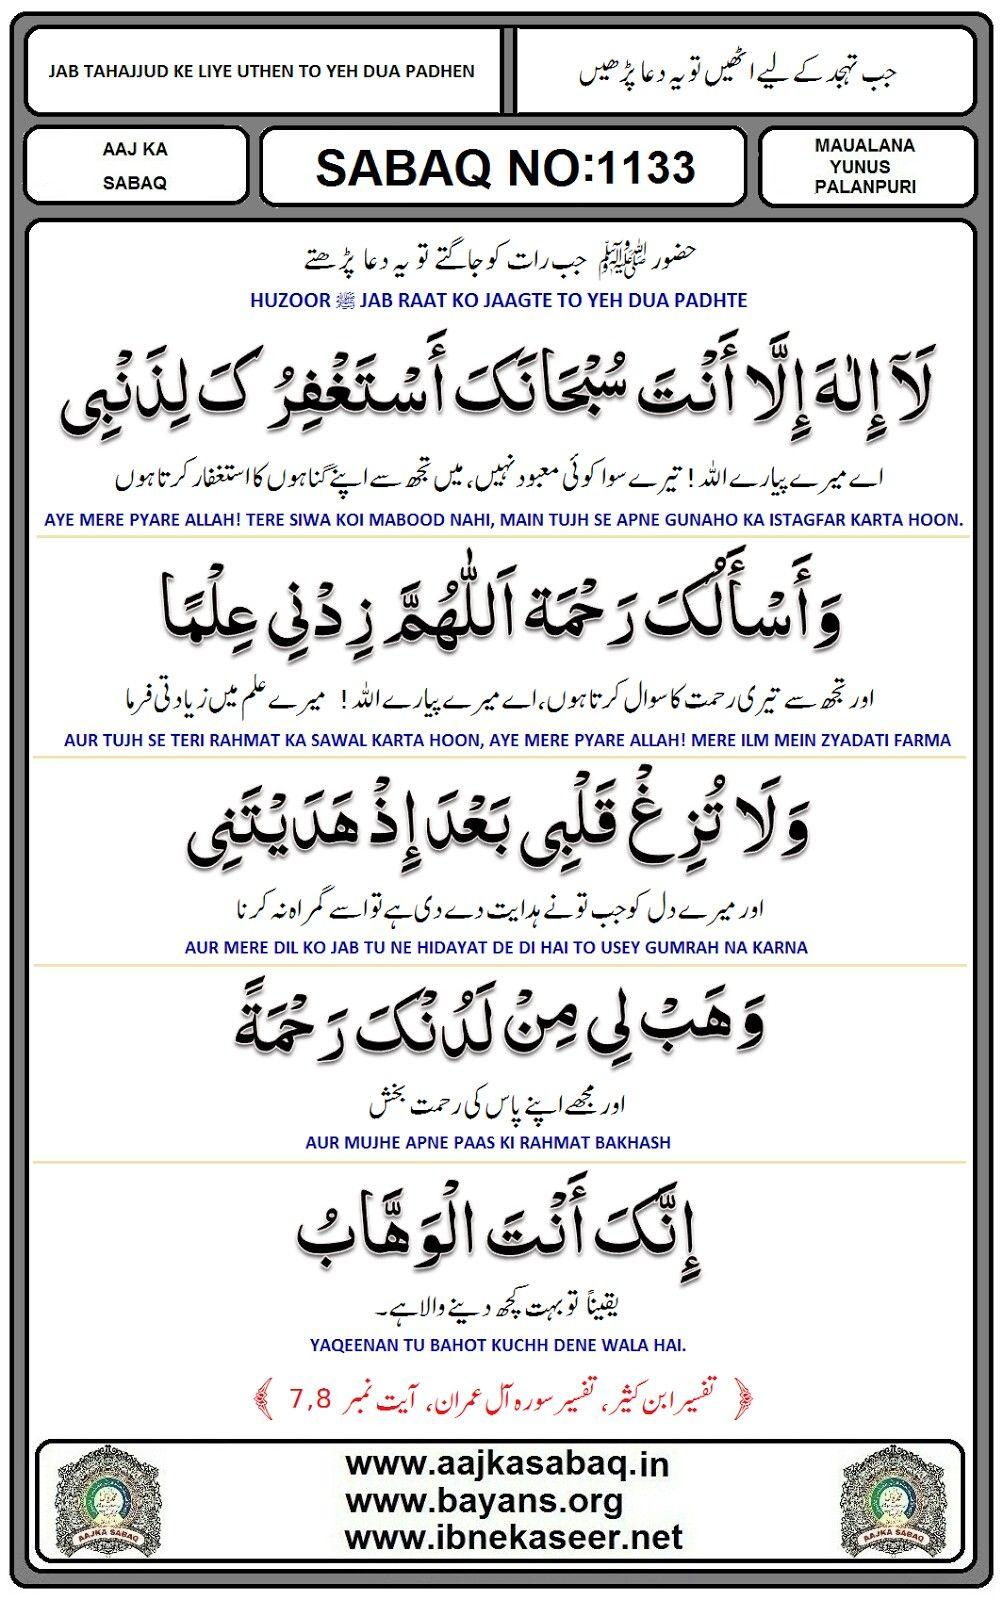 Pin by Muhammad Khan on Collection | Islam hadith, Islam